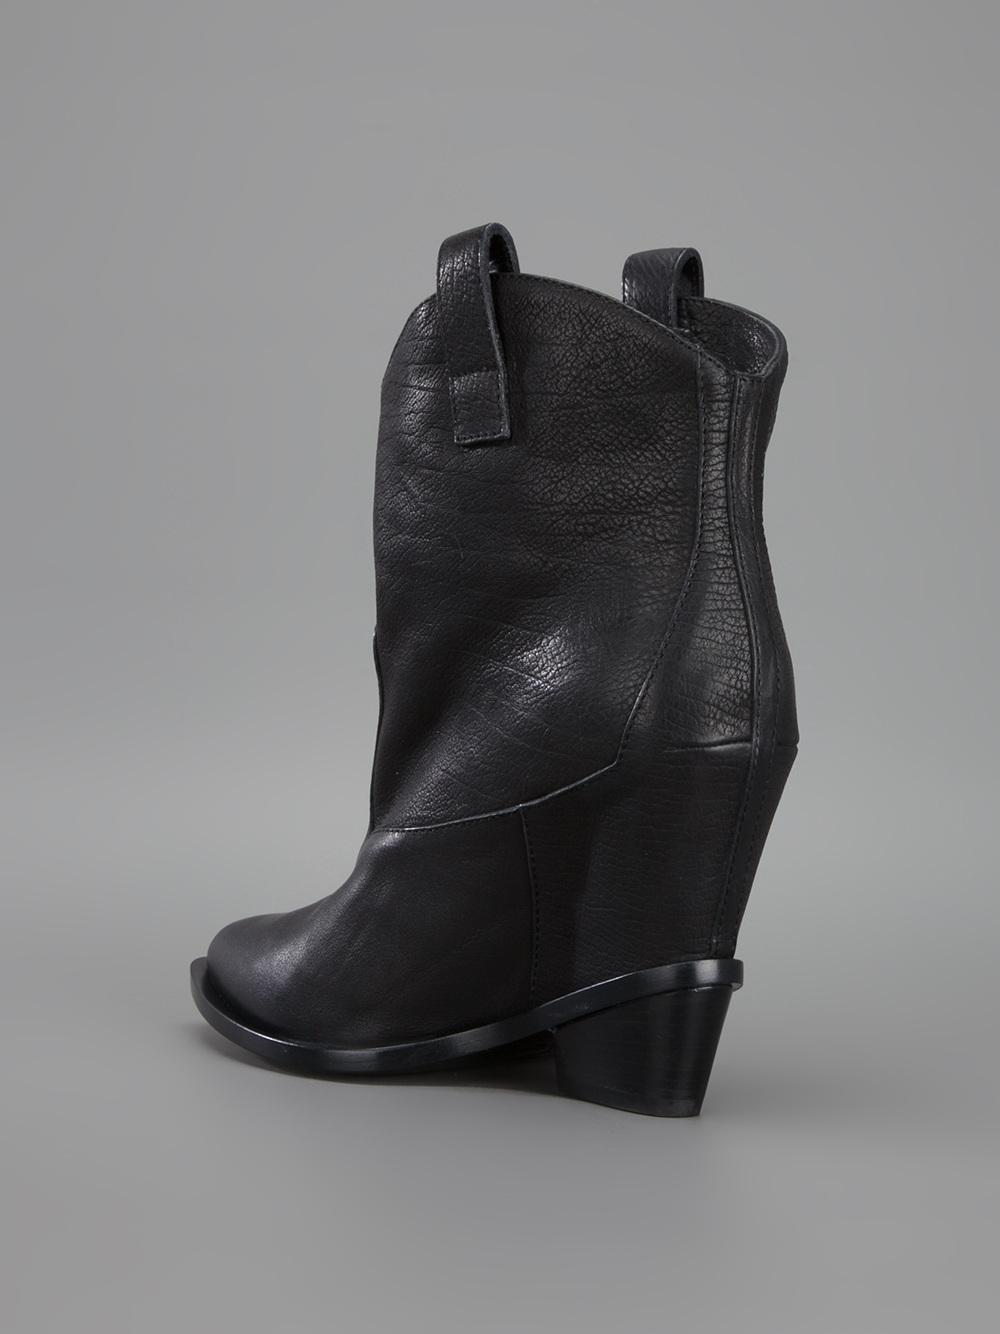 Giuseppe Zanotti Star Cowboy Boot In Black Lyst